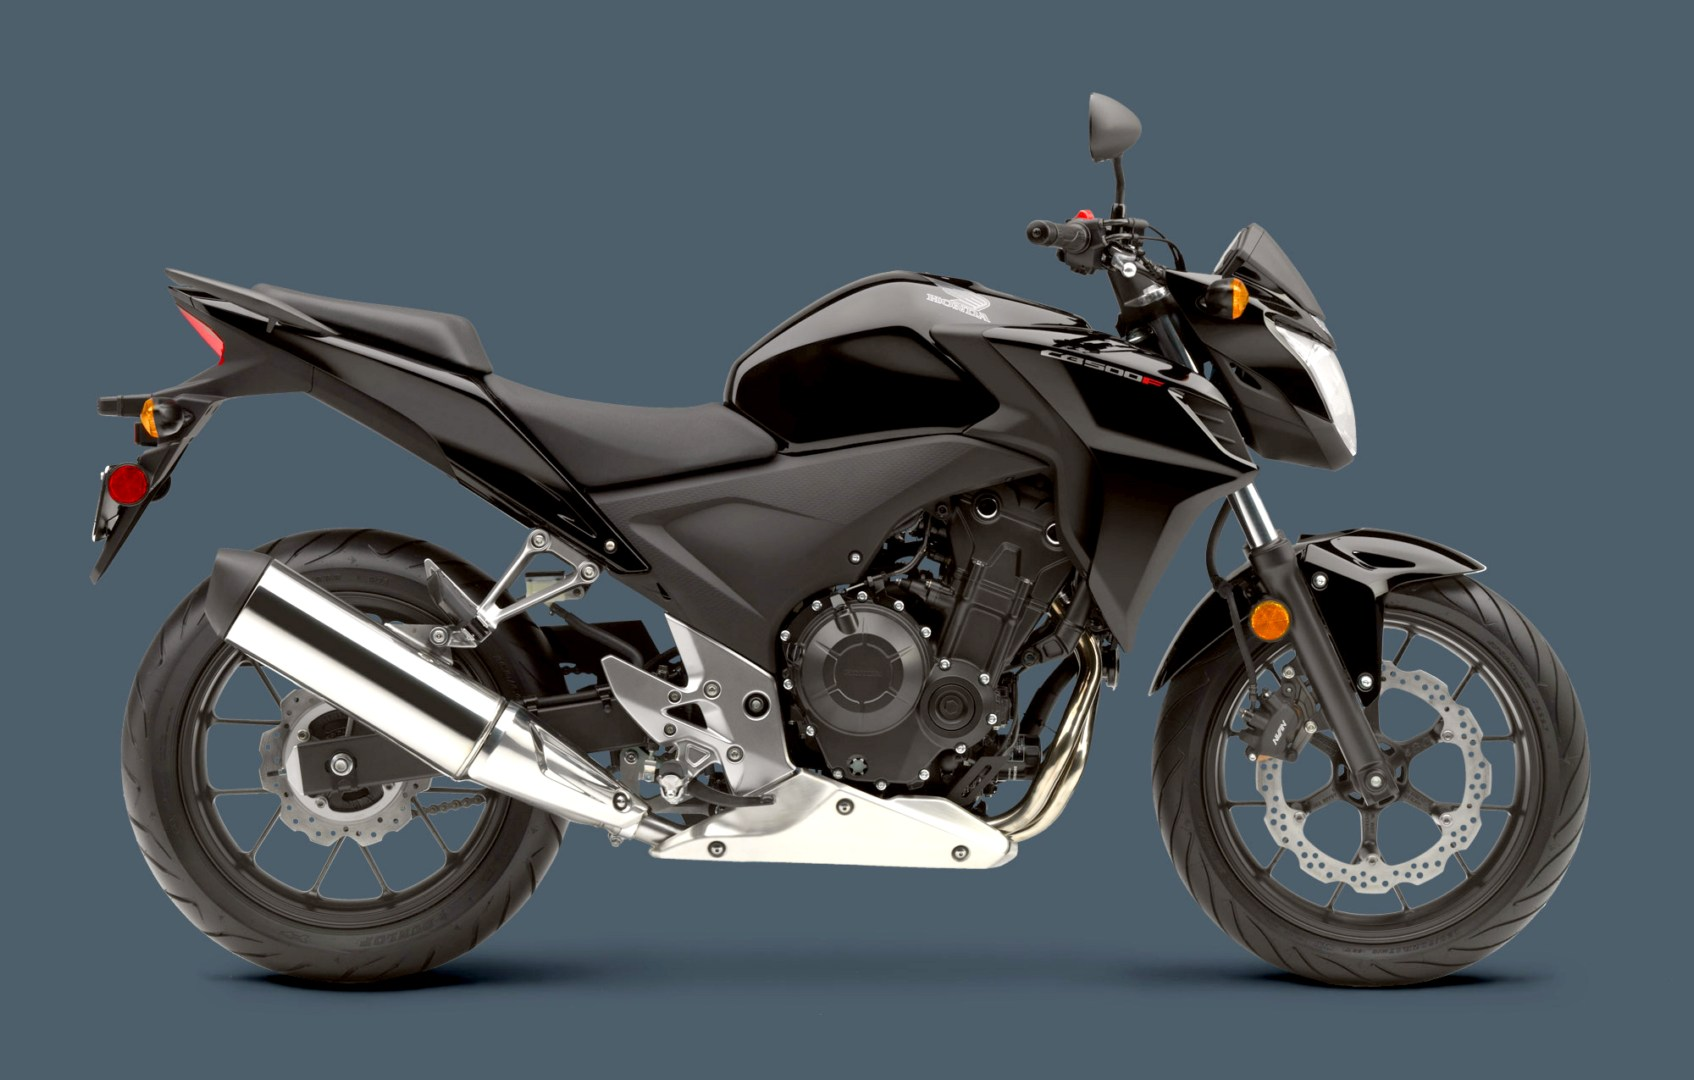 2013 Honda CB500F Detailed, Official Price Revealed - autoevolution